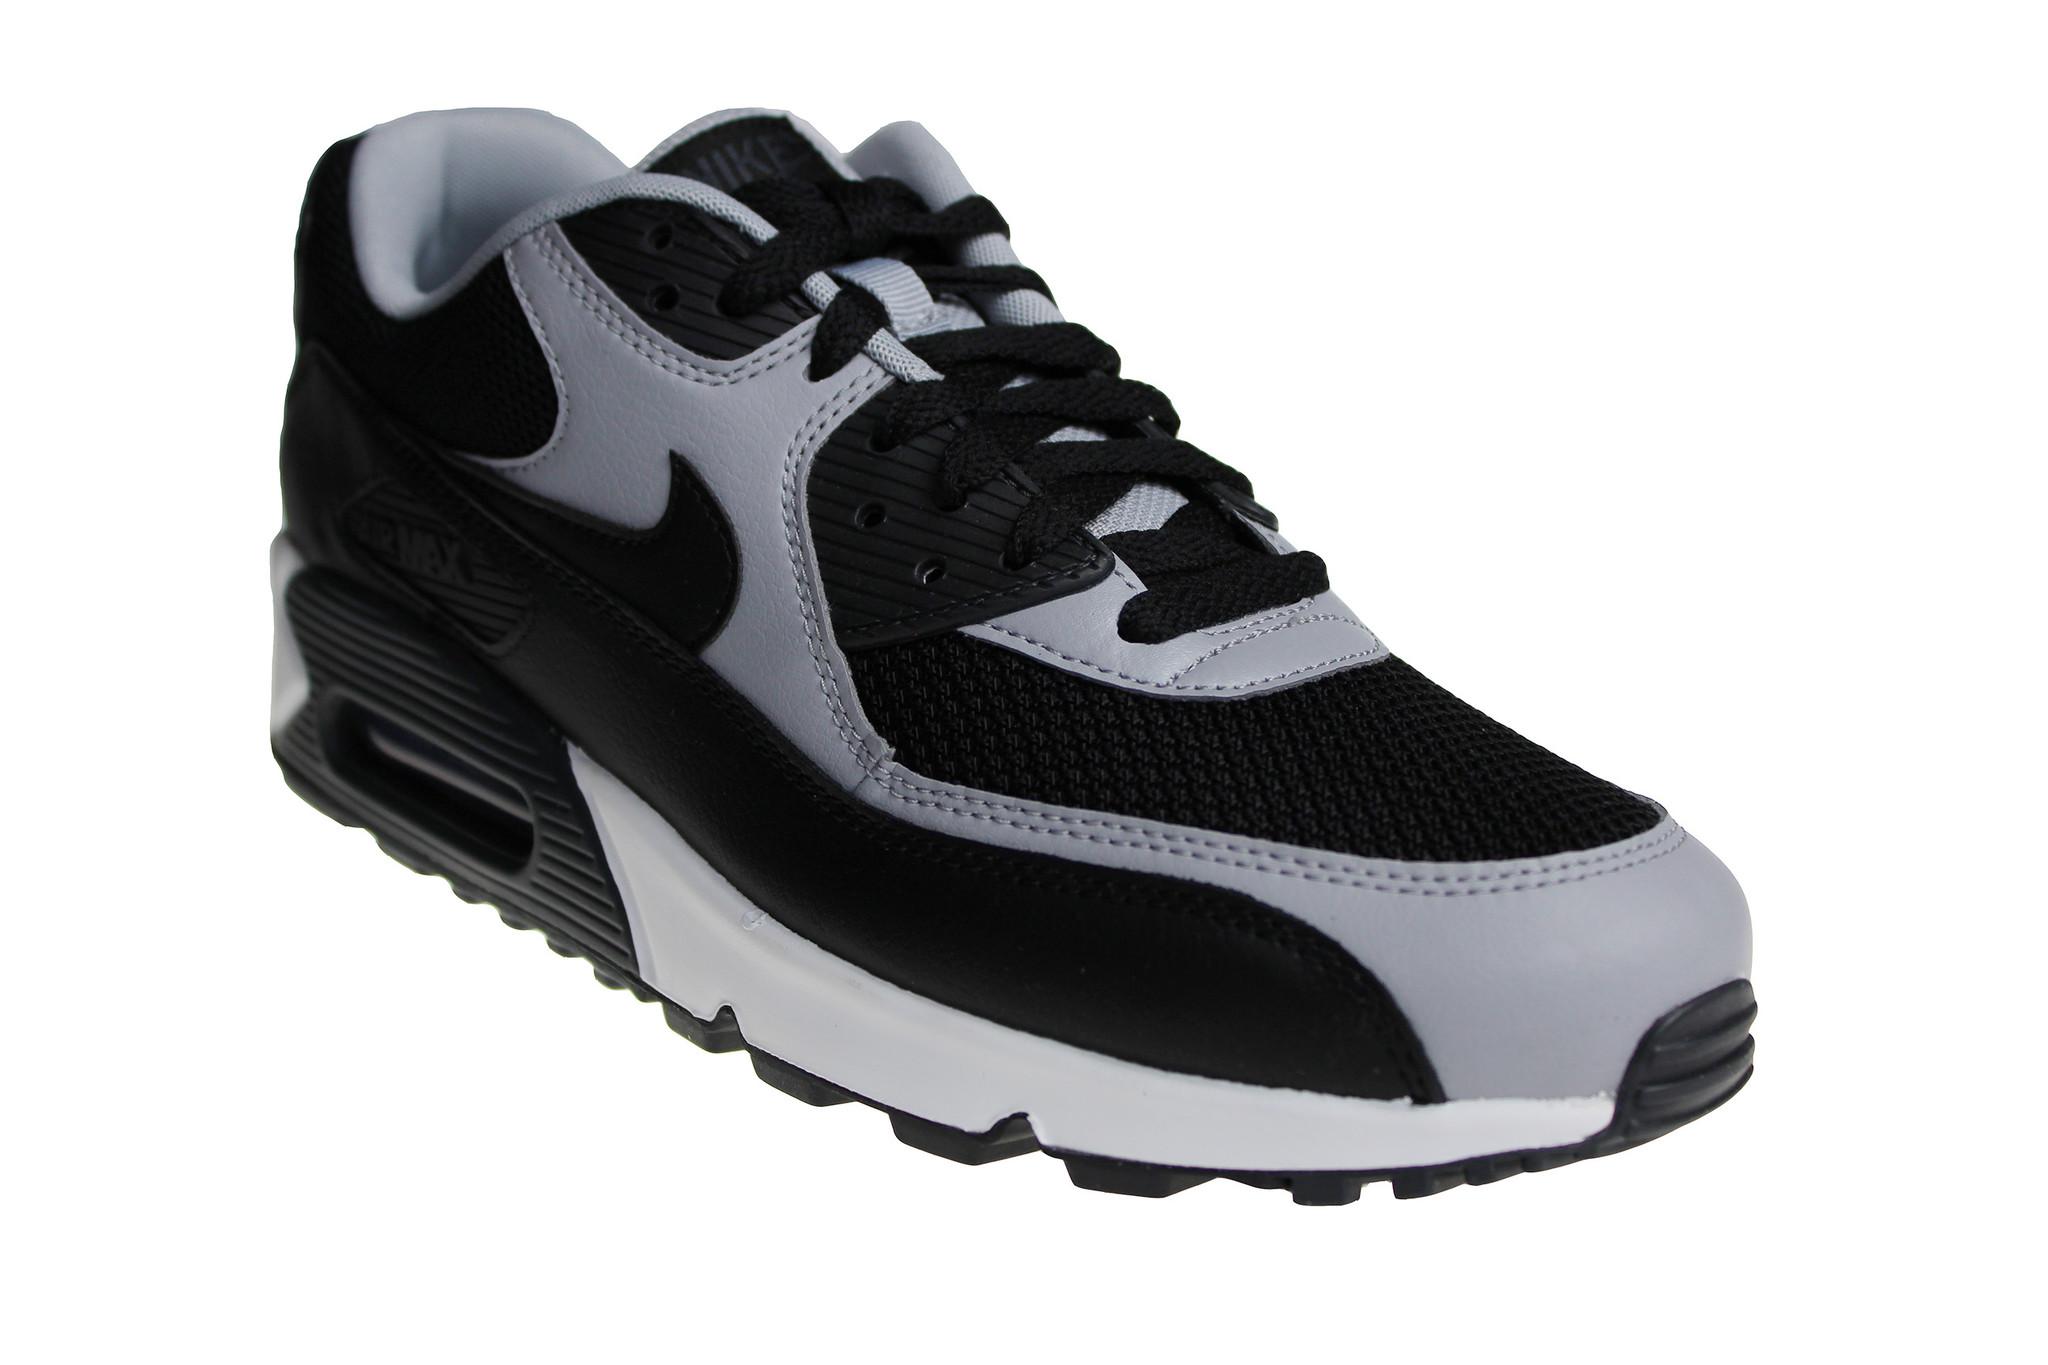 meilleures baskets 60ef8 df0f6 Nike Air Max 90 Essential (Black/Grey/White) 537384 053 Men's Sneakers